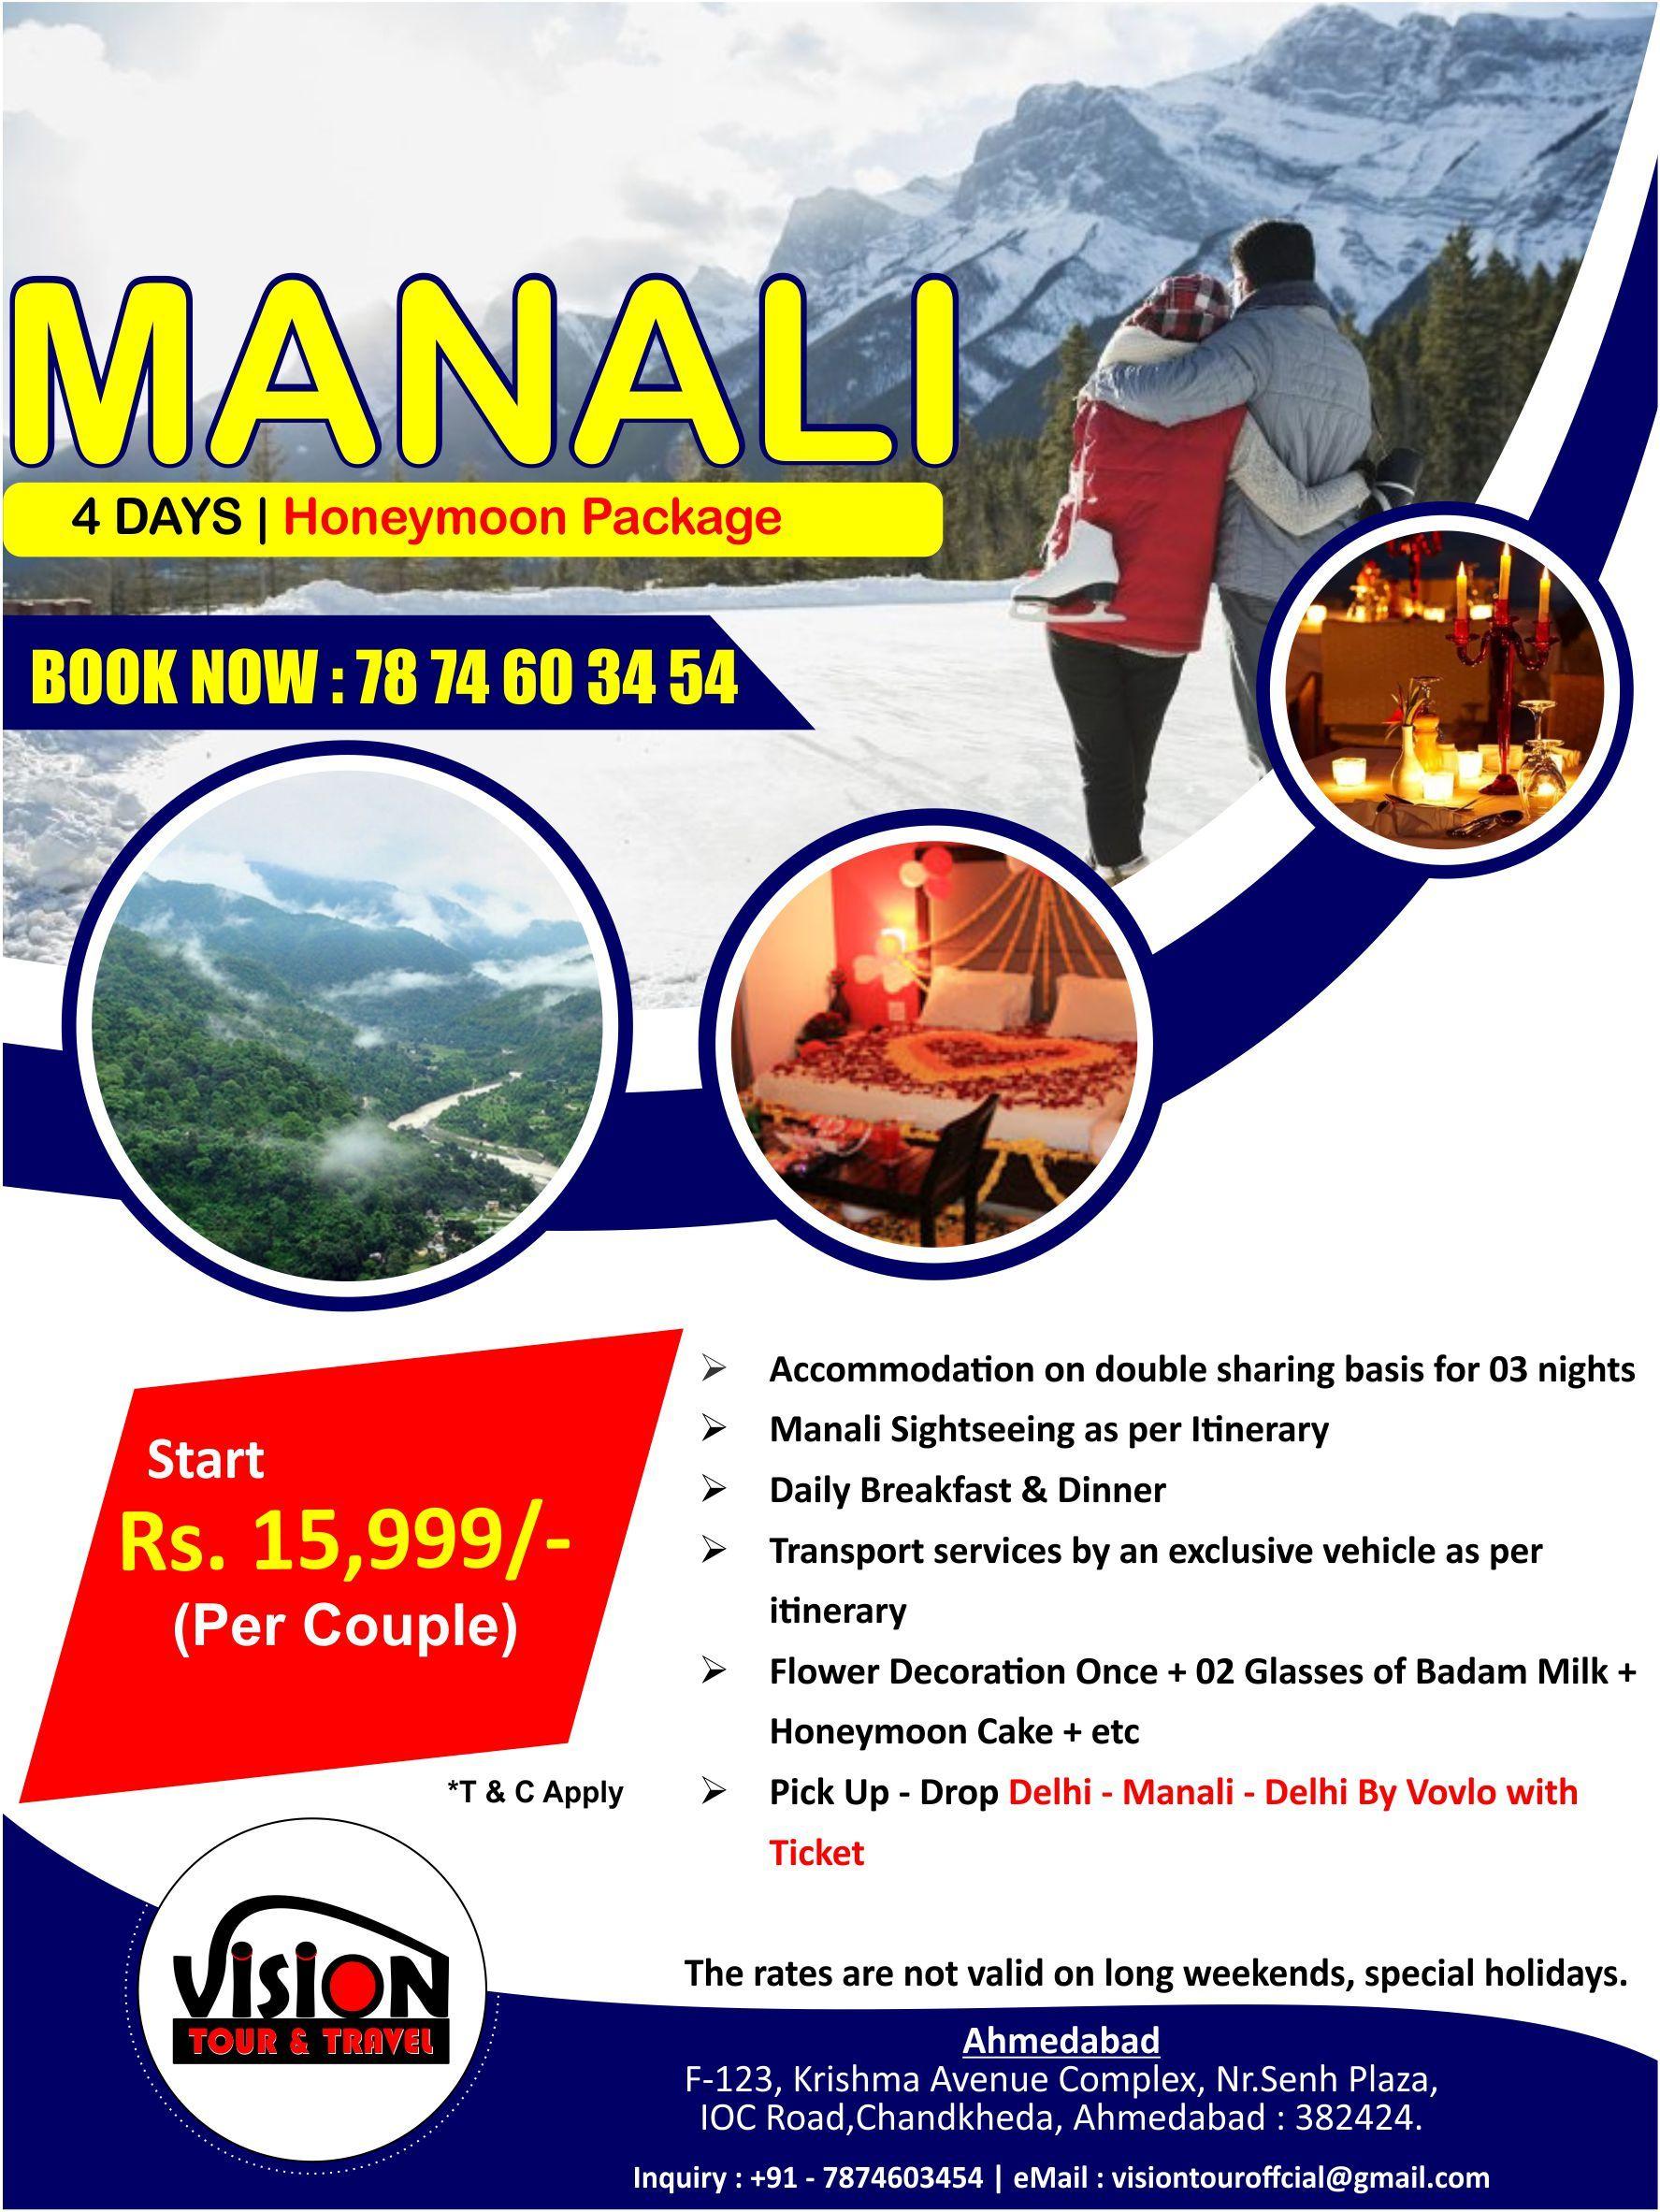 Manali Honeymoon Package Offer Valid till 30th, Aug